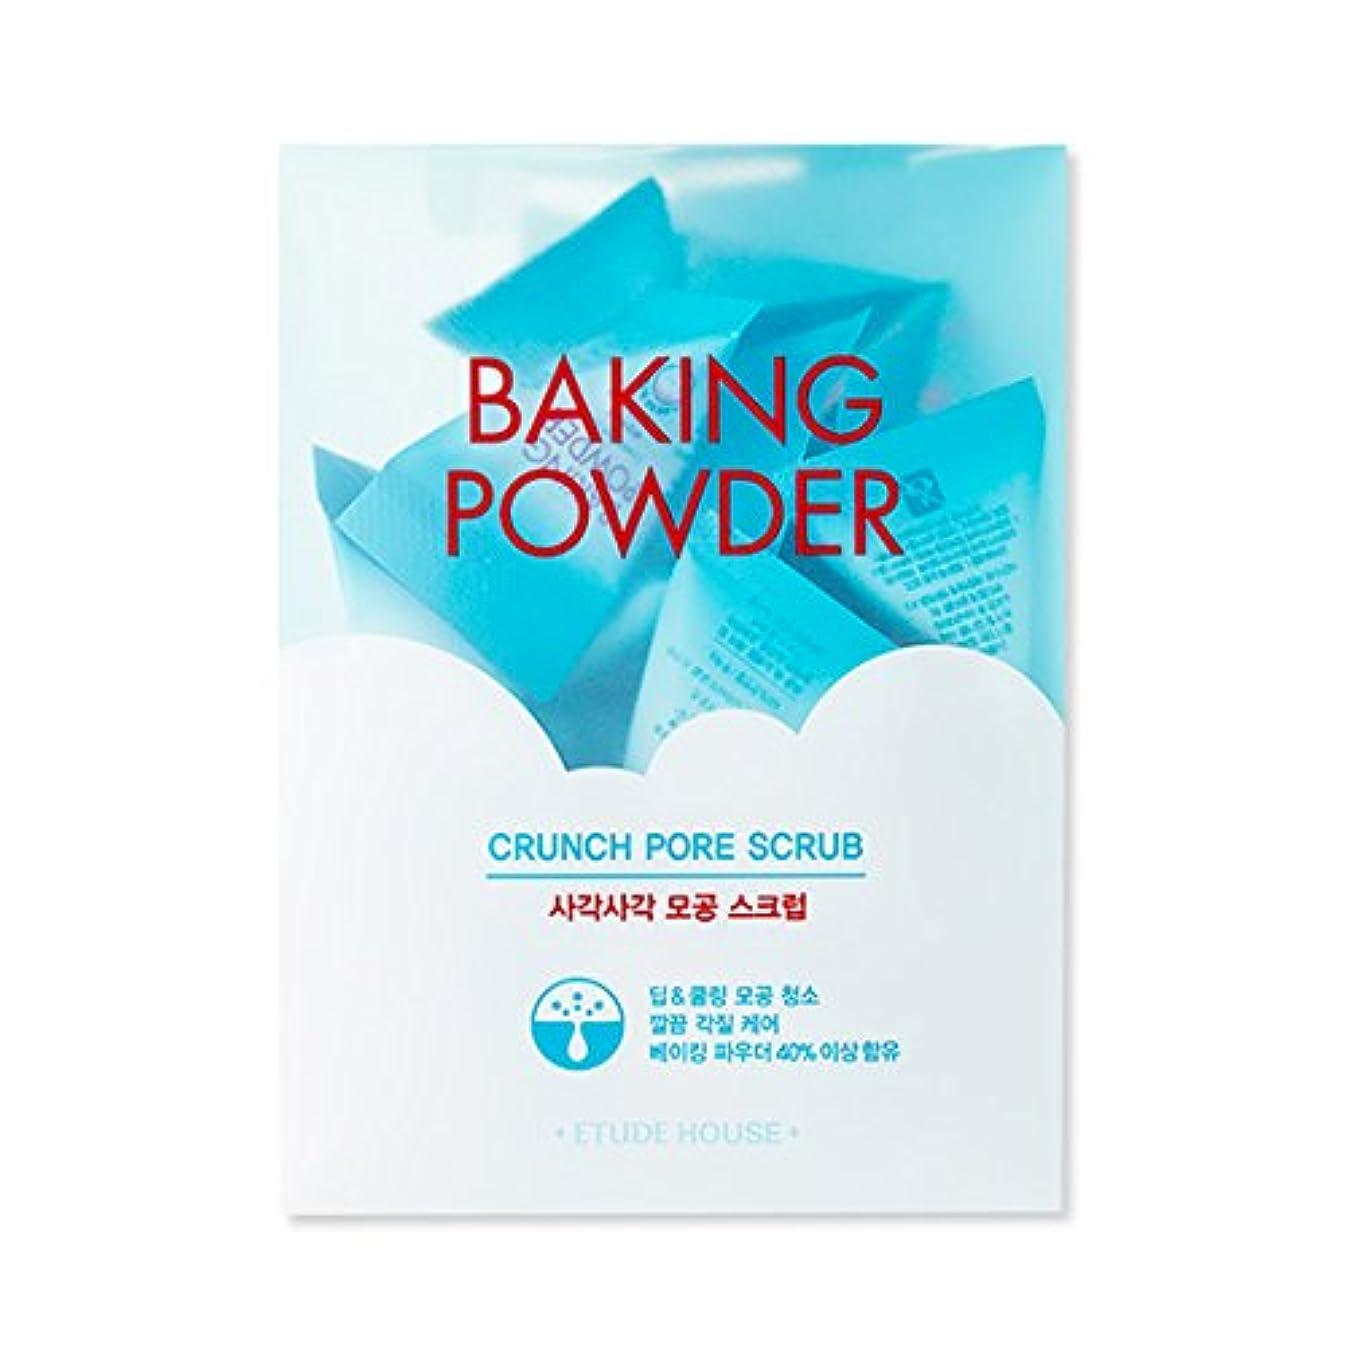 [2016 Upgrade!] ETUDE HOUSE Baking Powder Crunch Pore Scrub 7g×24ea/エチュードハウス ベーキング パウダー クランチ ポア スクラブ 7g×24ea [...